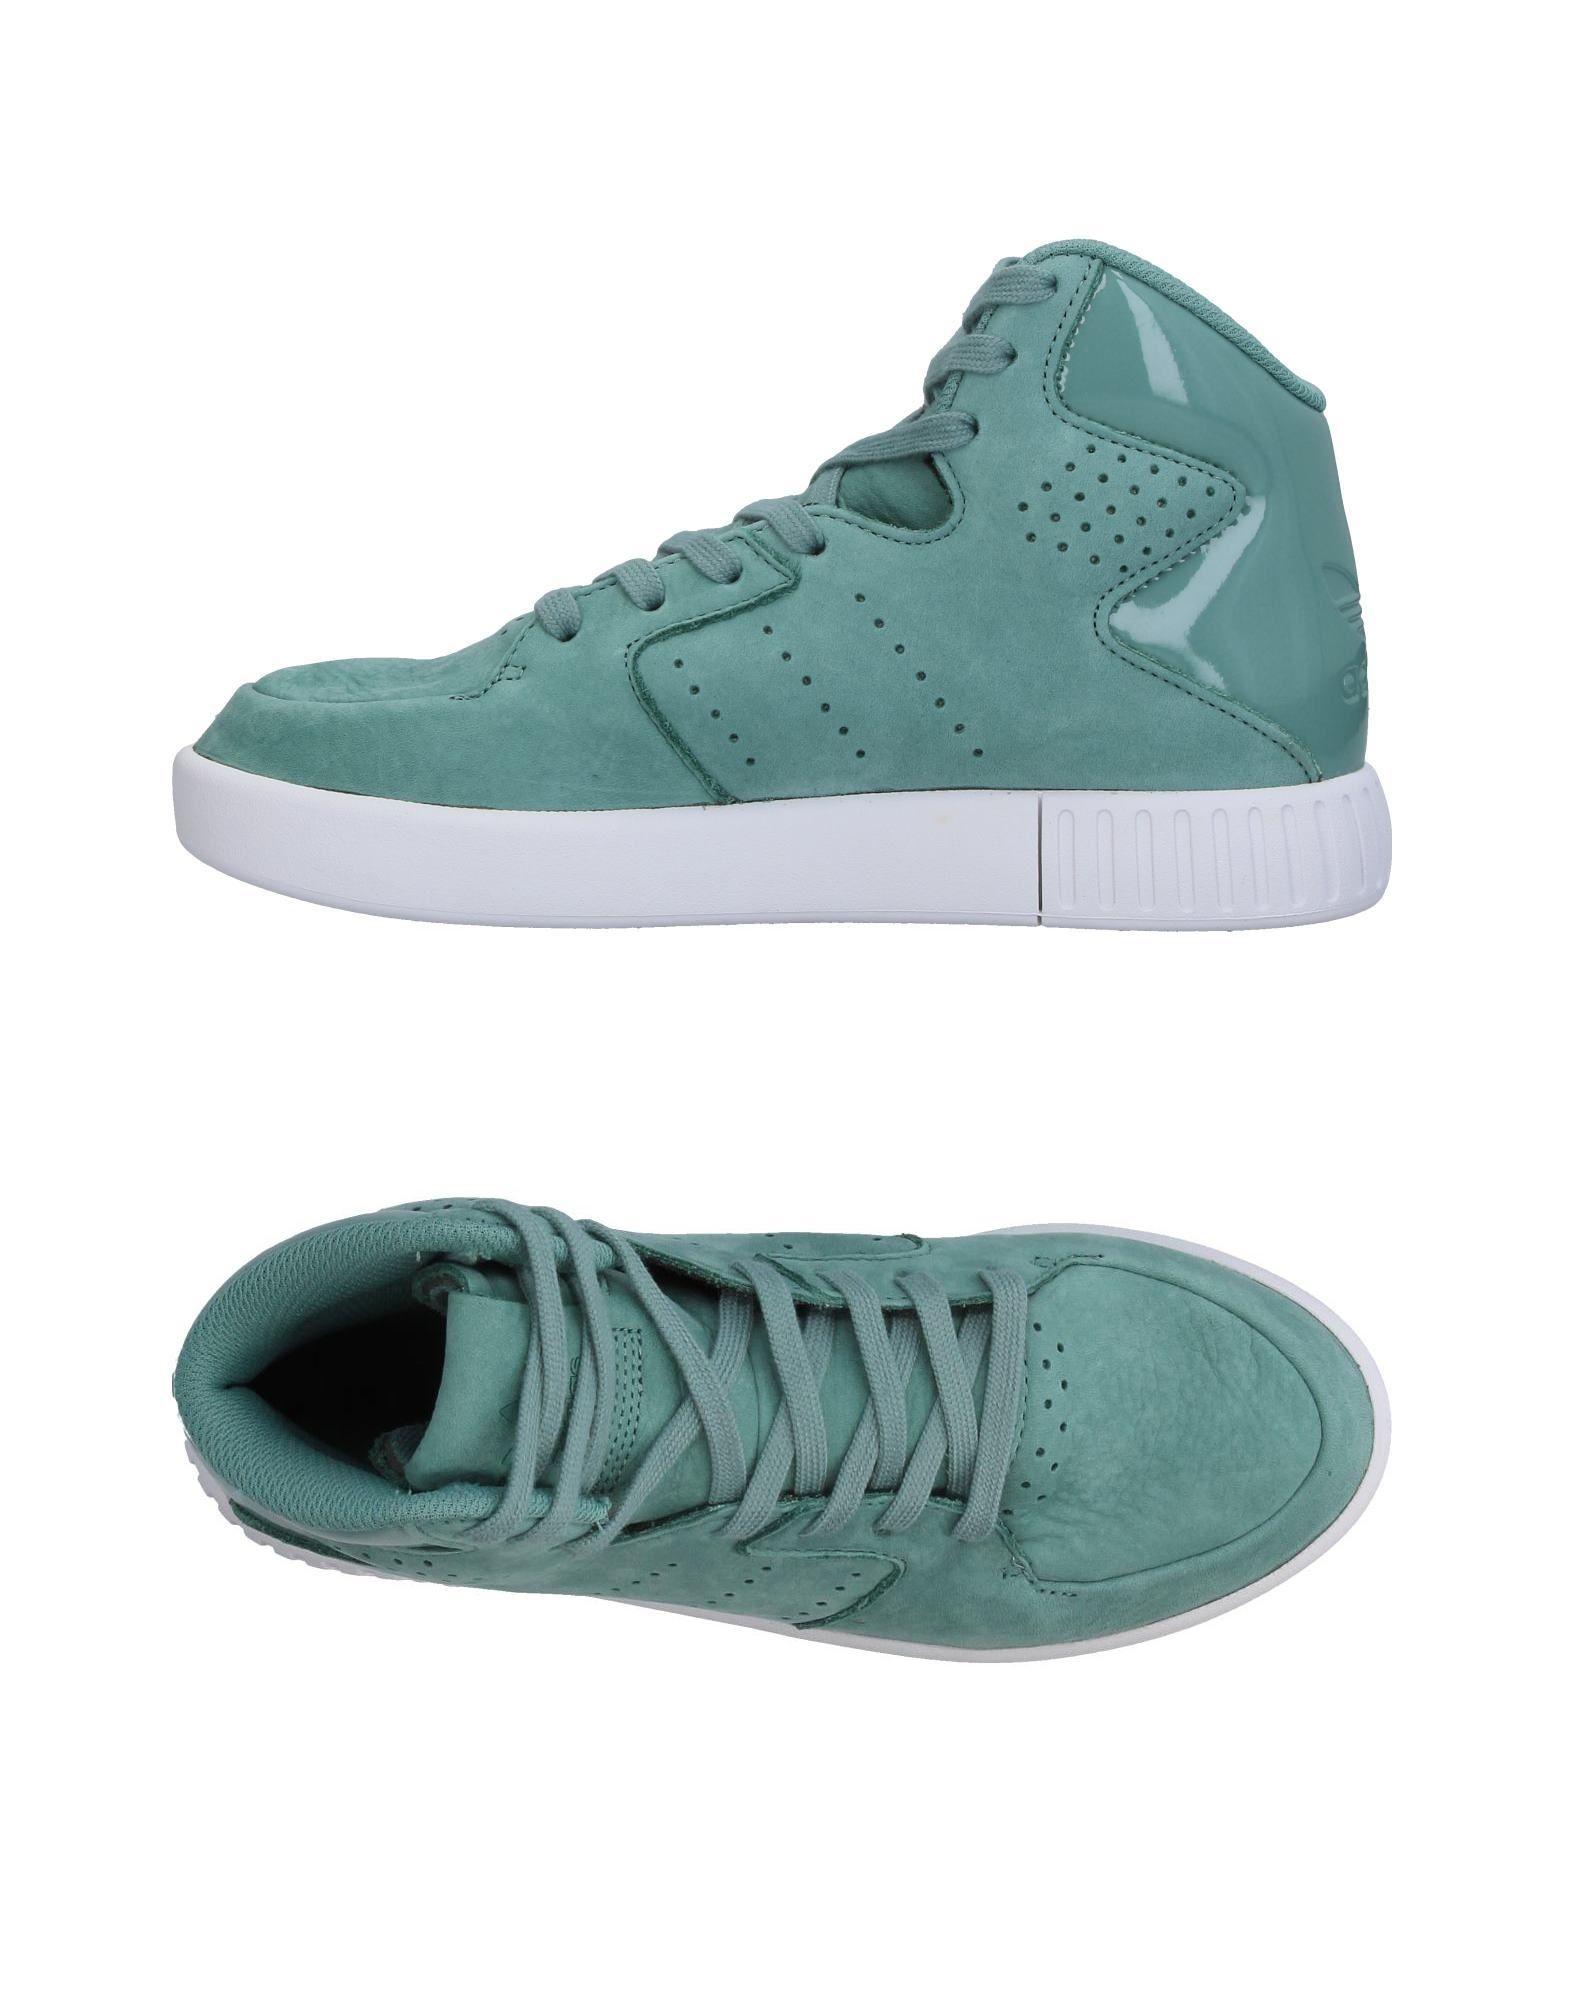 Scarpe da - Ginnastica Adidas Originals Donna - da 11417914XF 0ca6c9